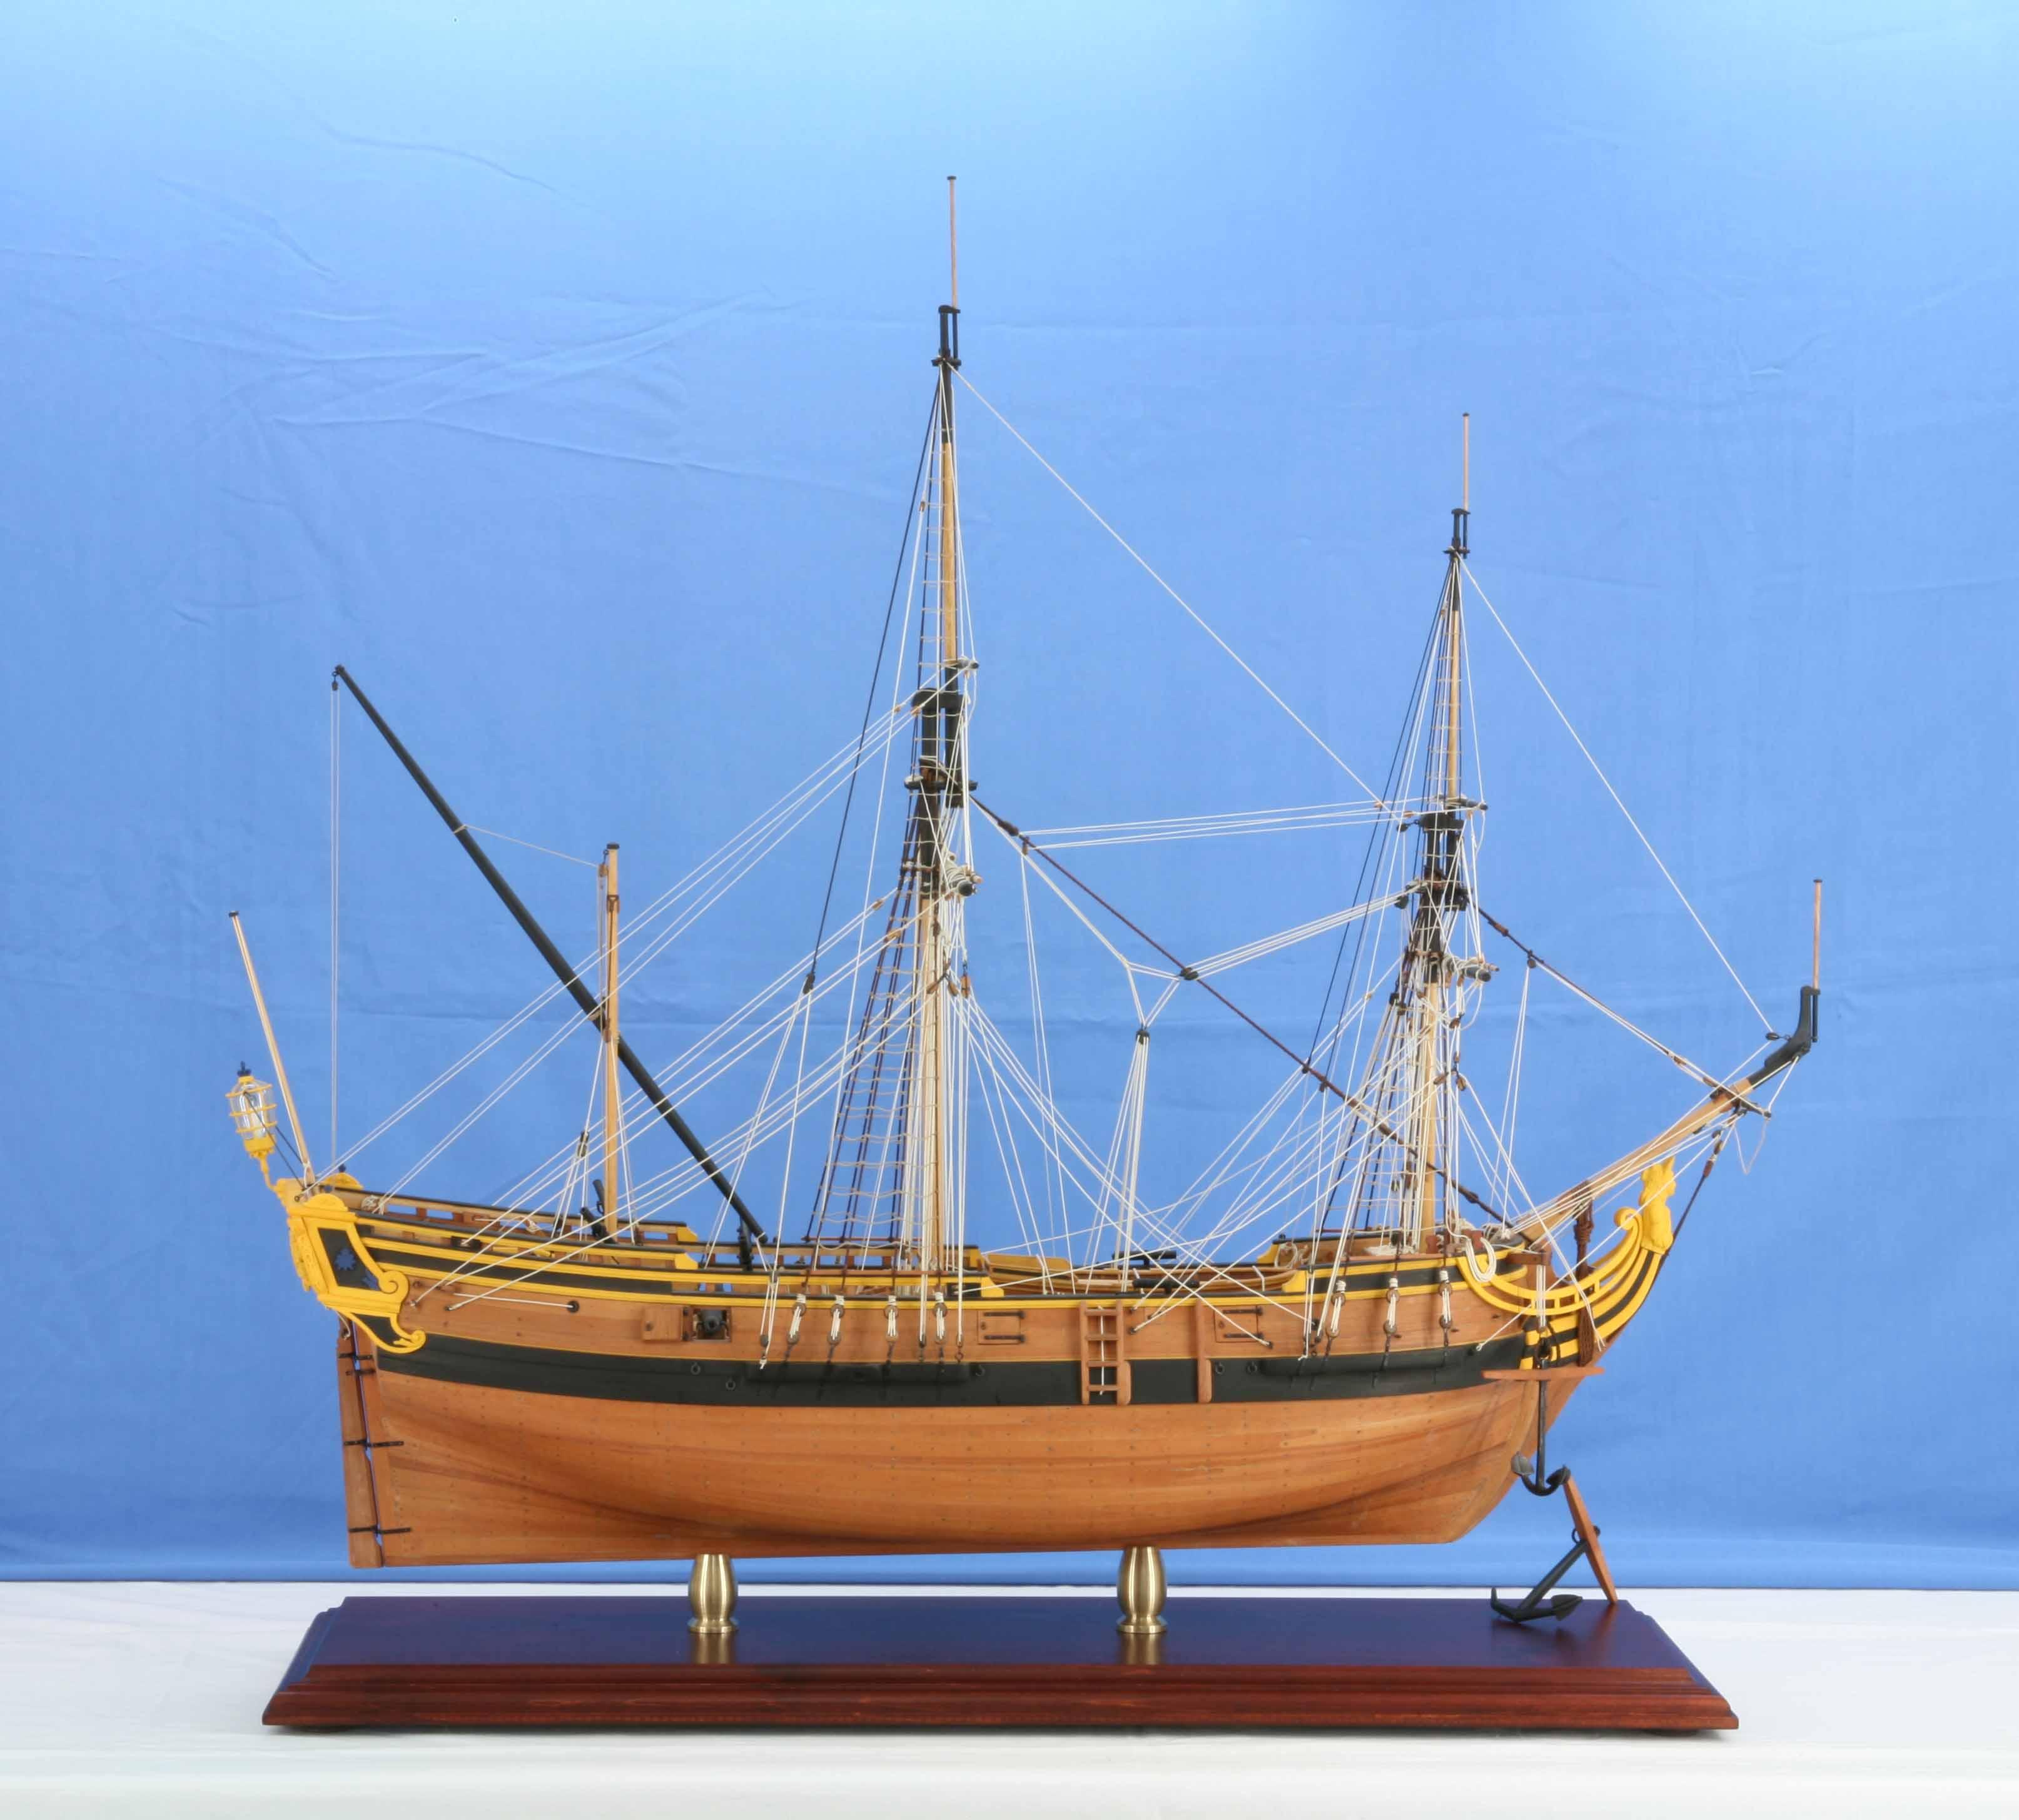 Photos ship model La Belle of 1686, views of entire ship